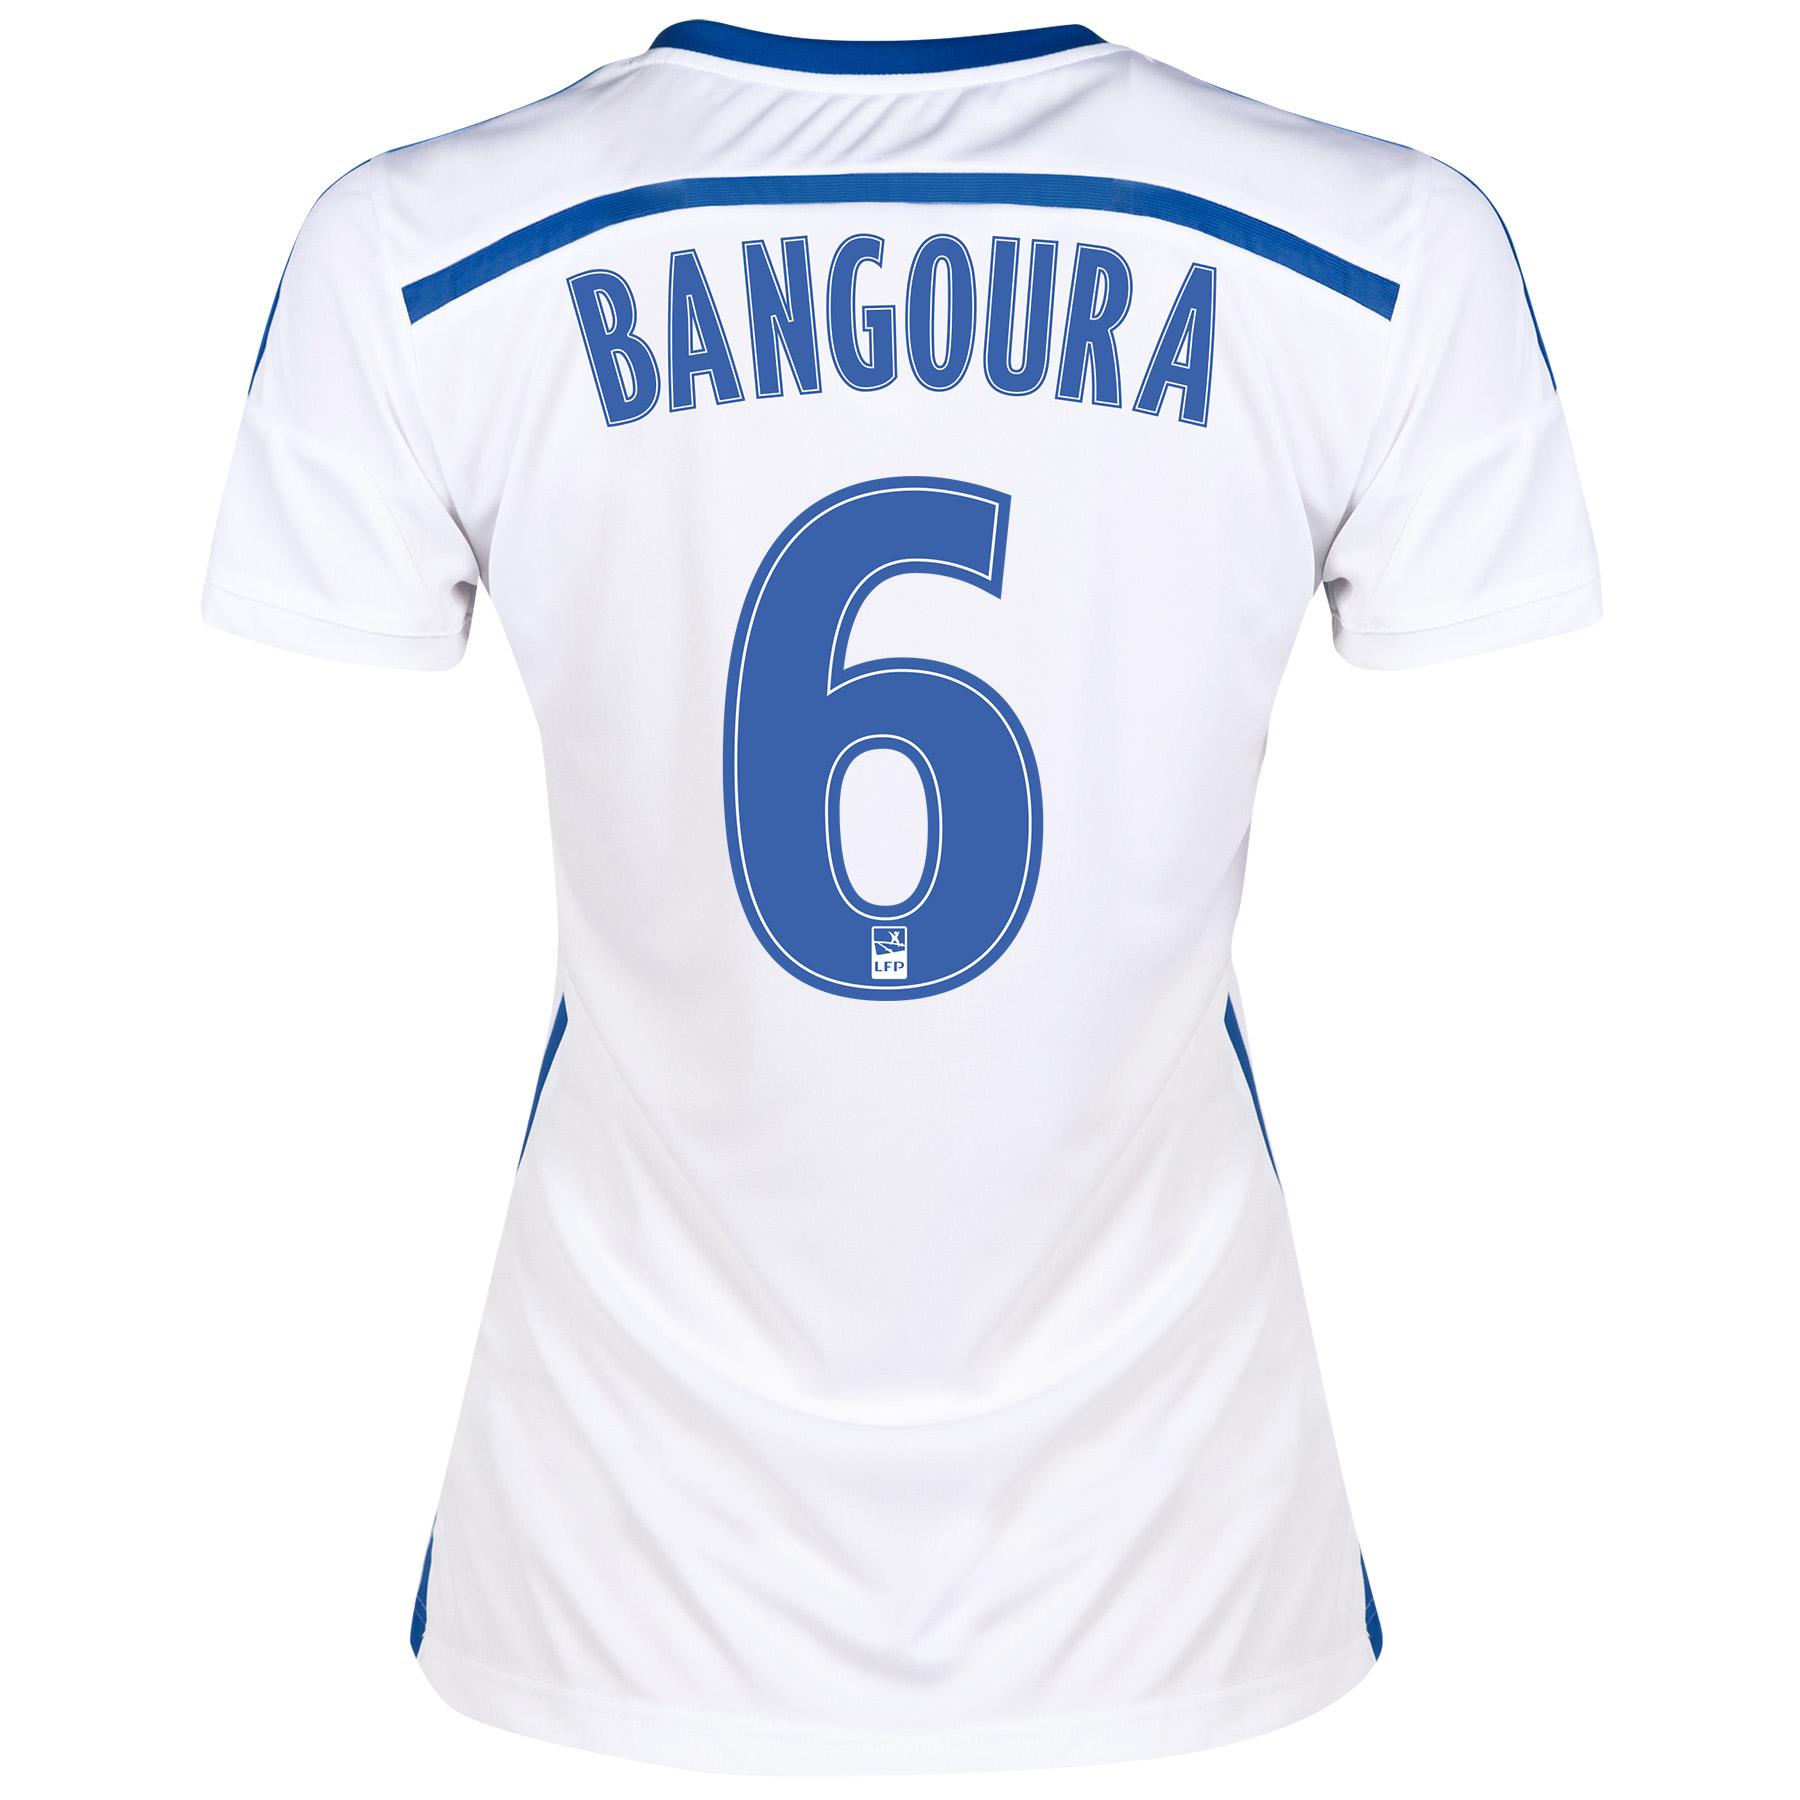 Olympique de Marseille Home Shirt Short Sleeve - Womens 2014/15 White with Bangoura 6 printing